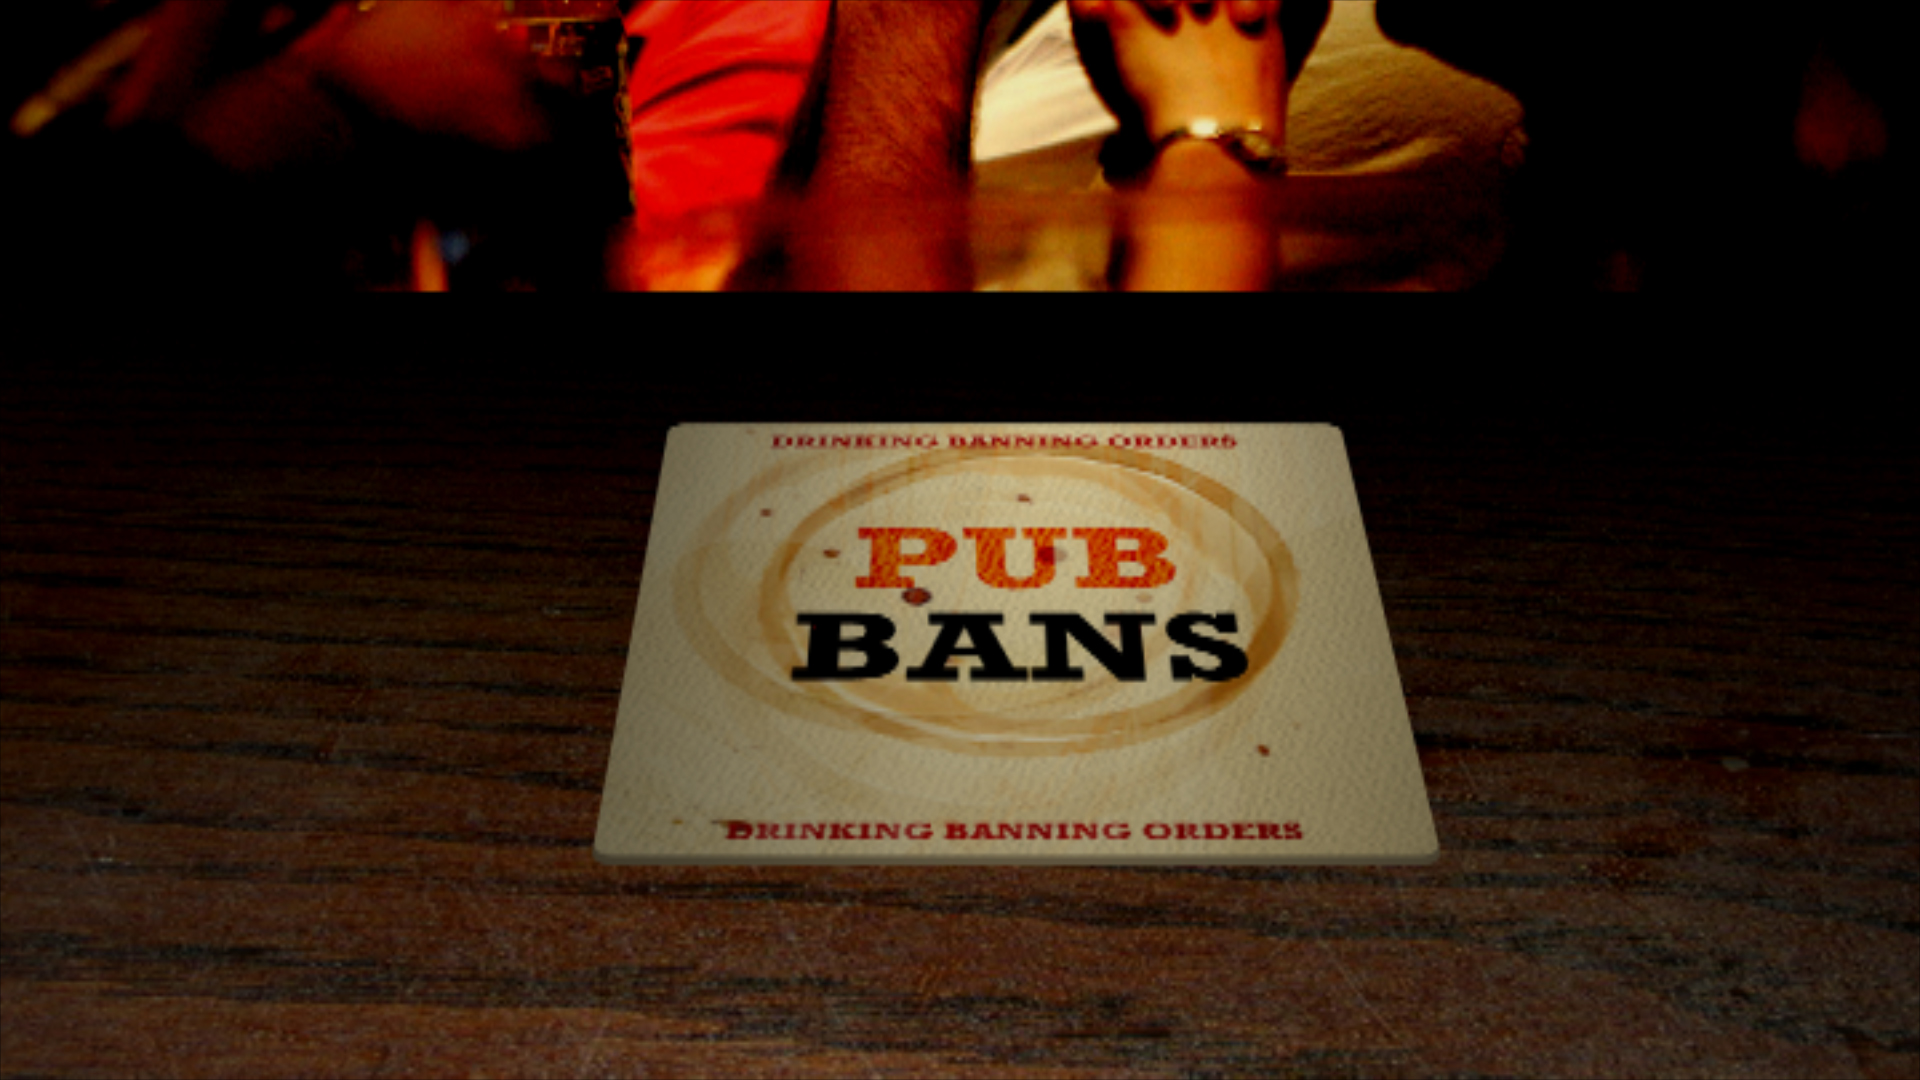 Drink Bans.jpg